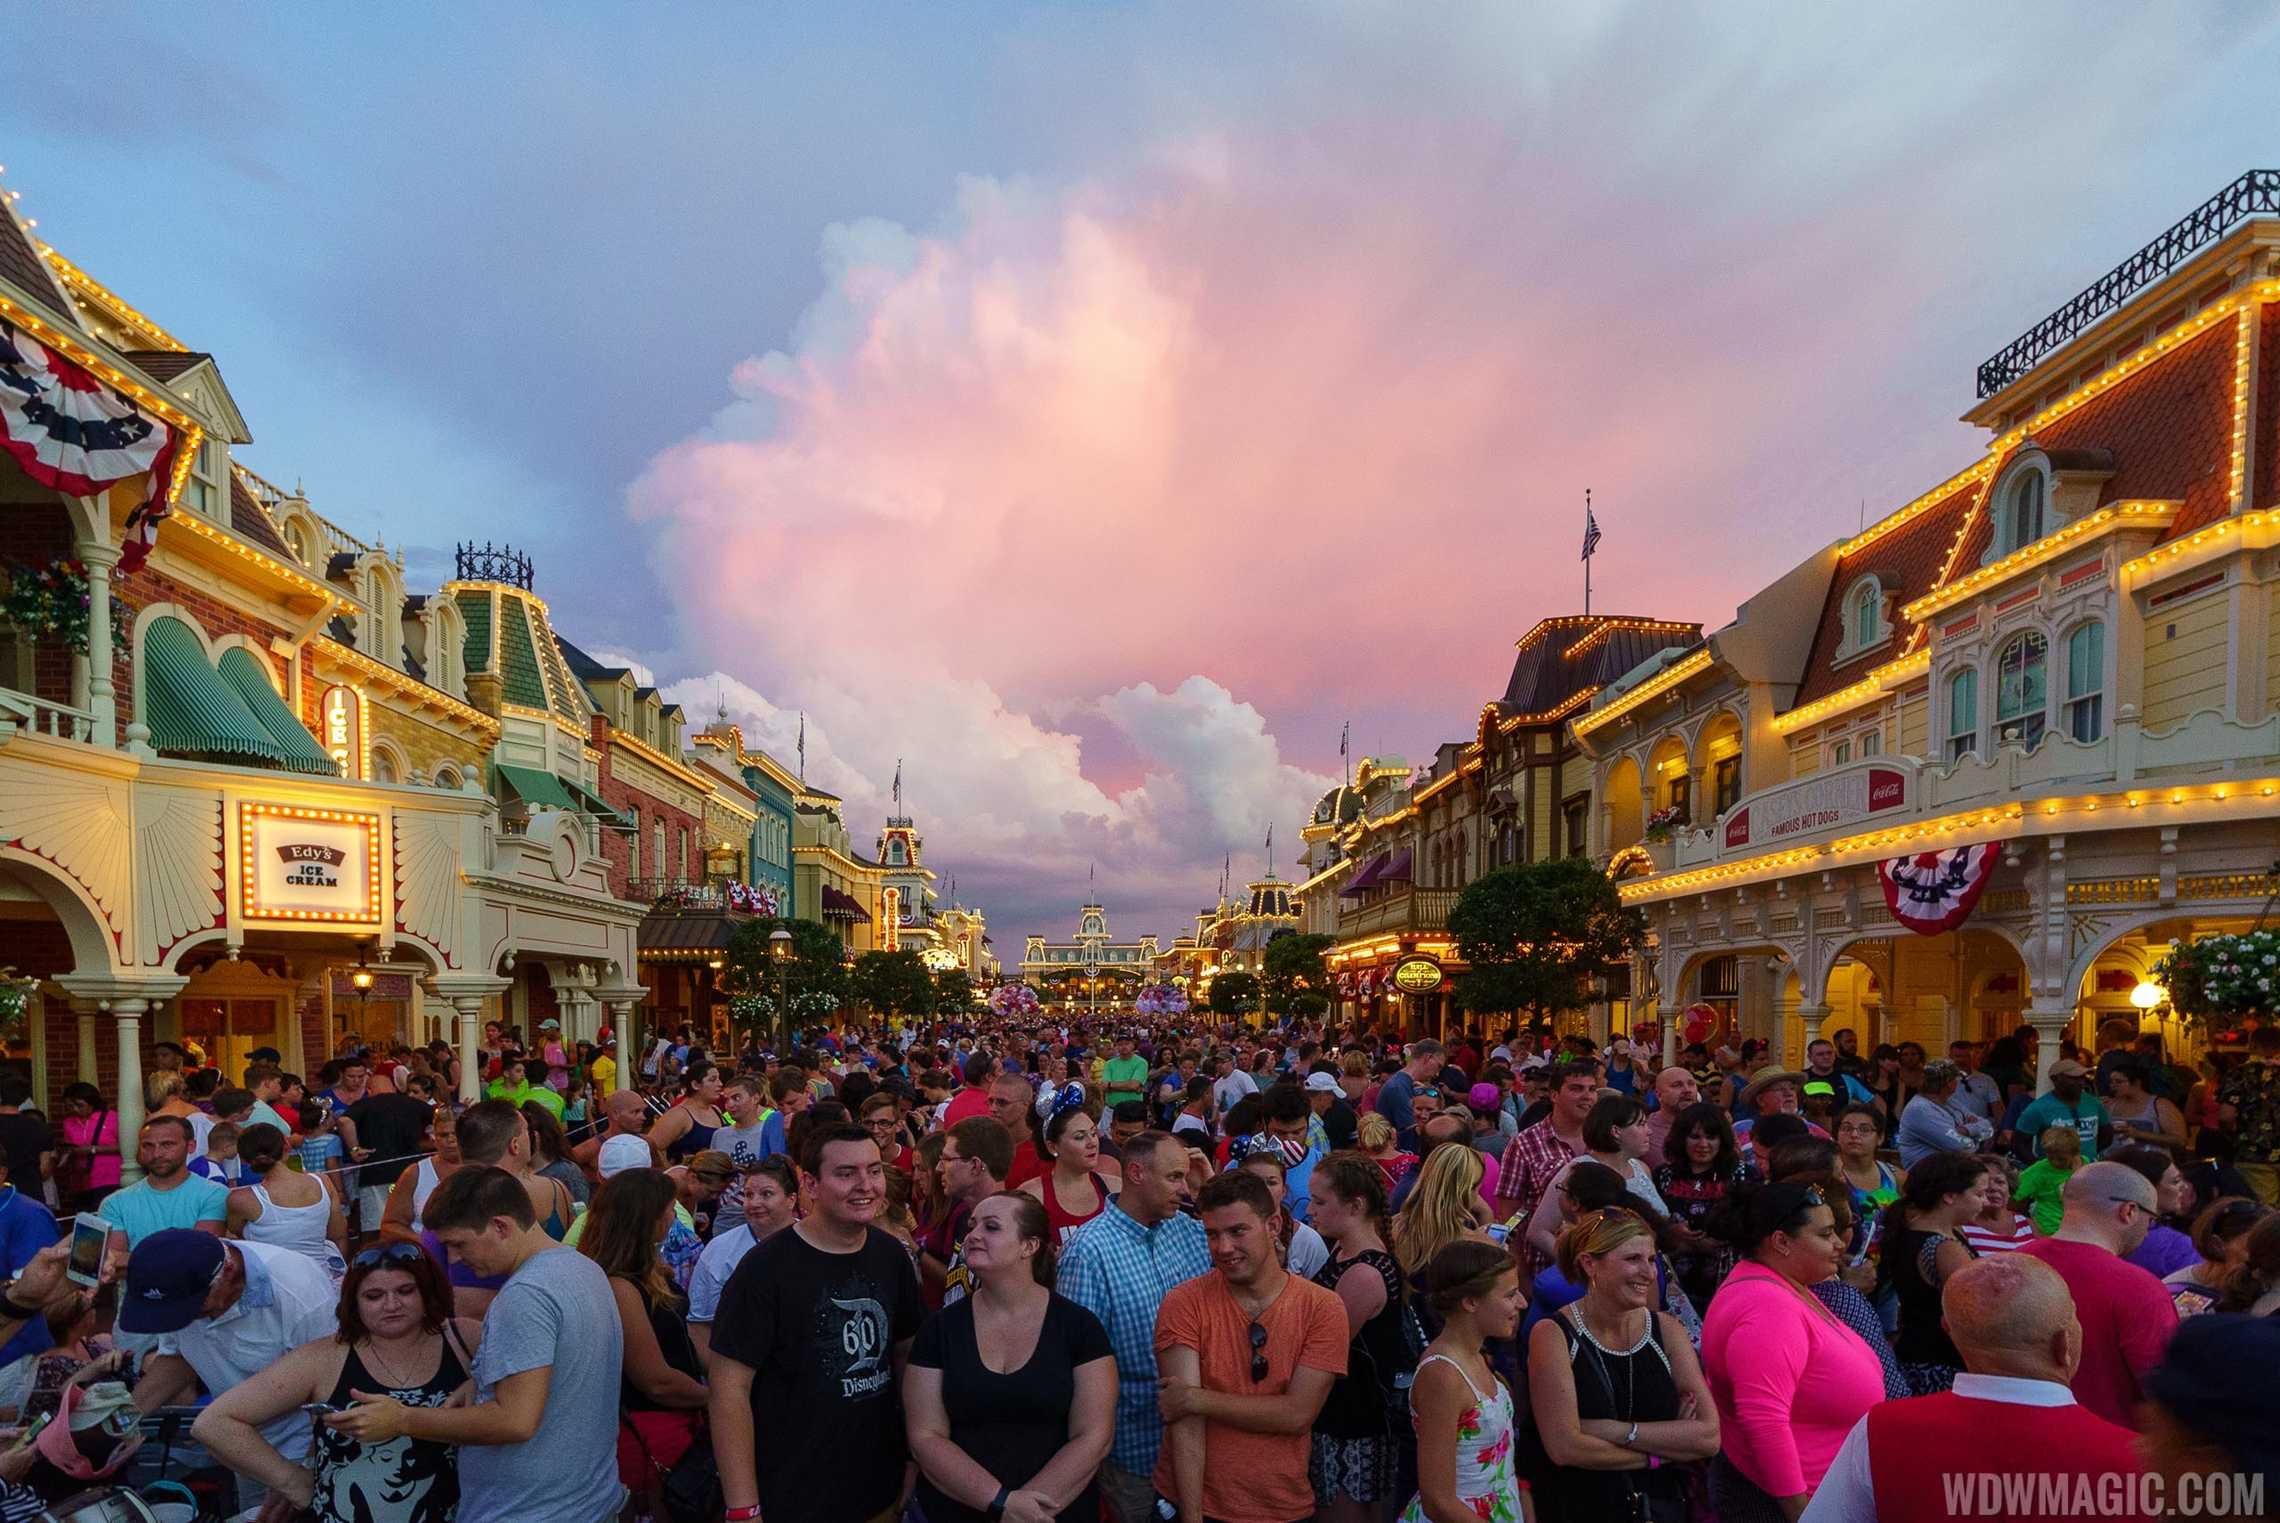 Crowds at the Magic Kingdom